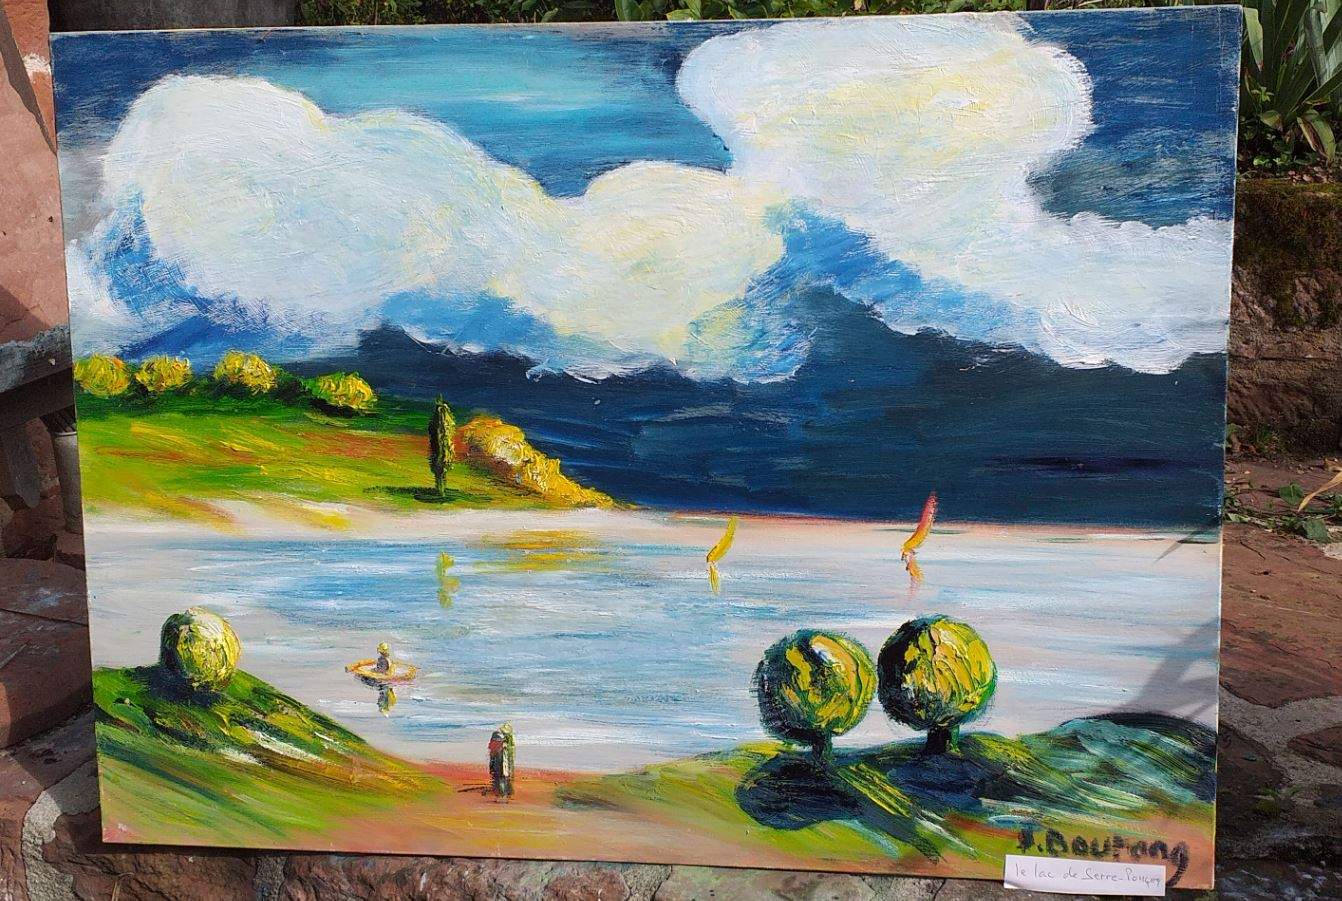 The Serre Ponçon lake-painting-rene-boutang-collonges-la-rouge-2